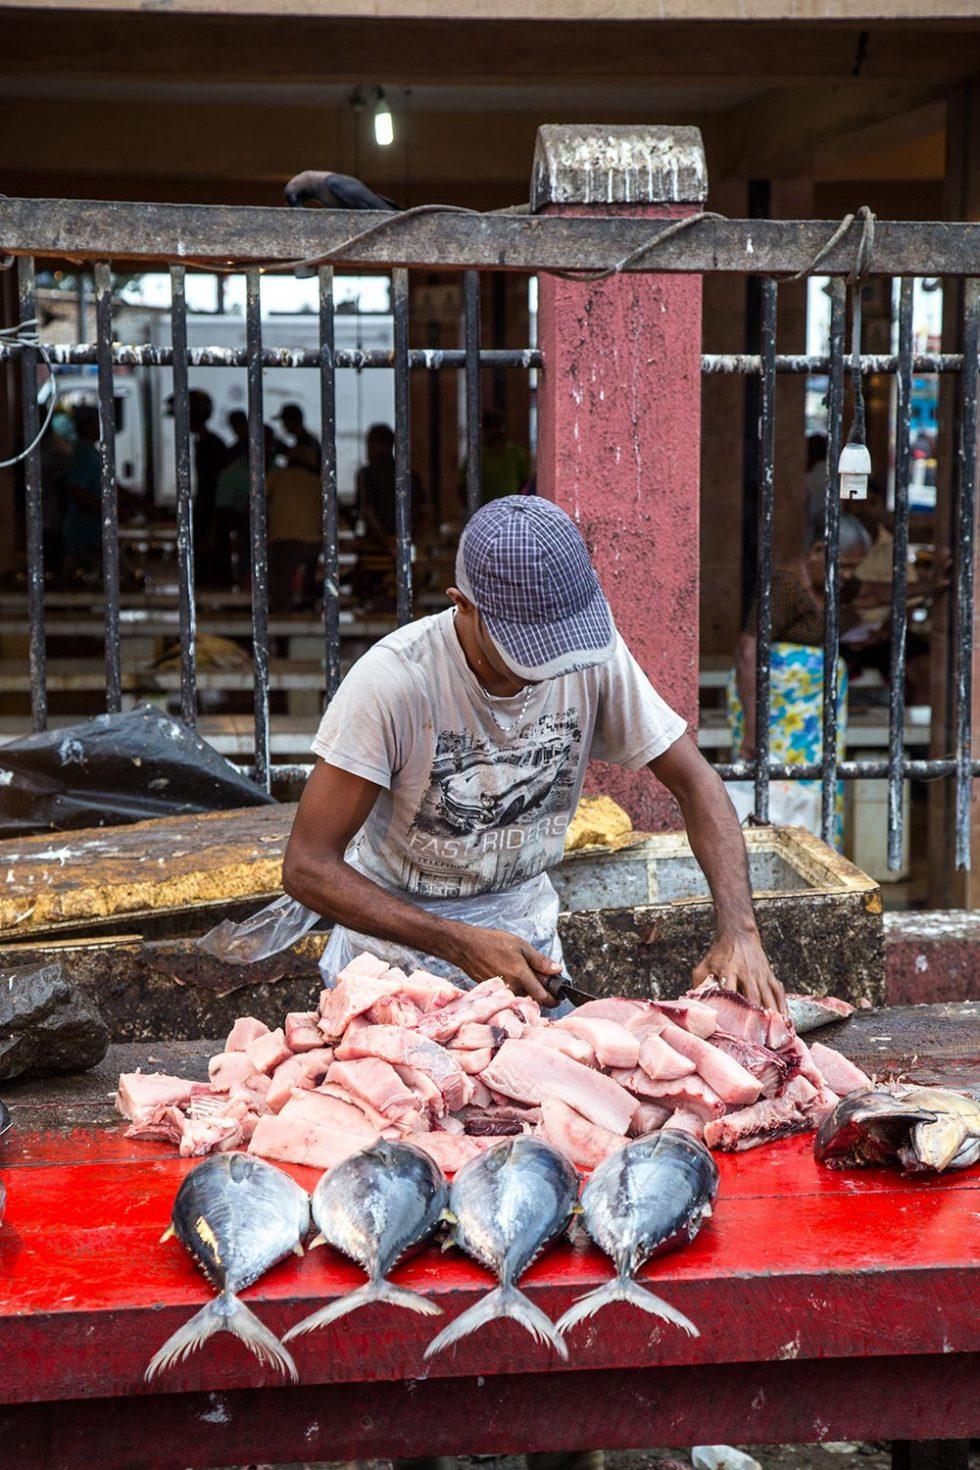 Fisherman preparing fish at the Fish Market in Negombo   Happymind Travels